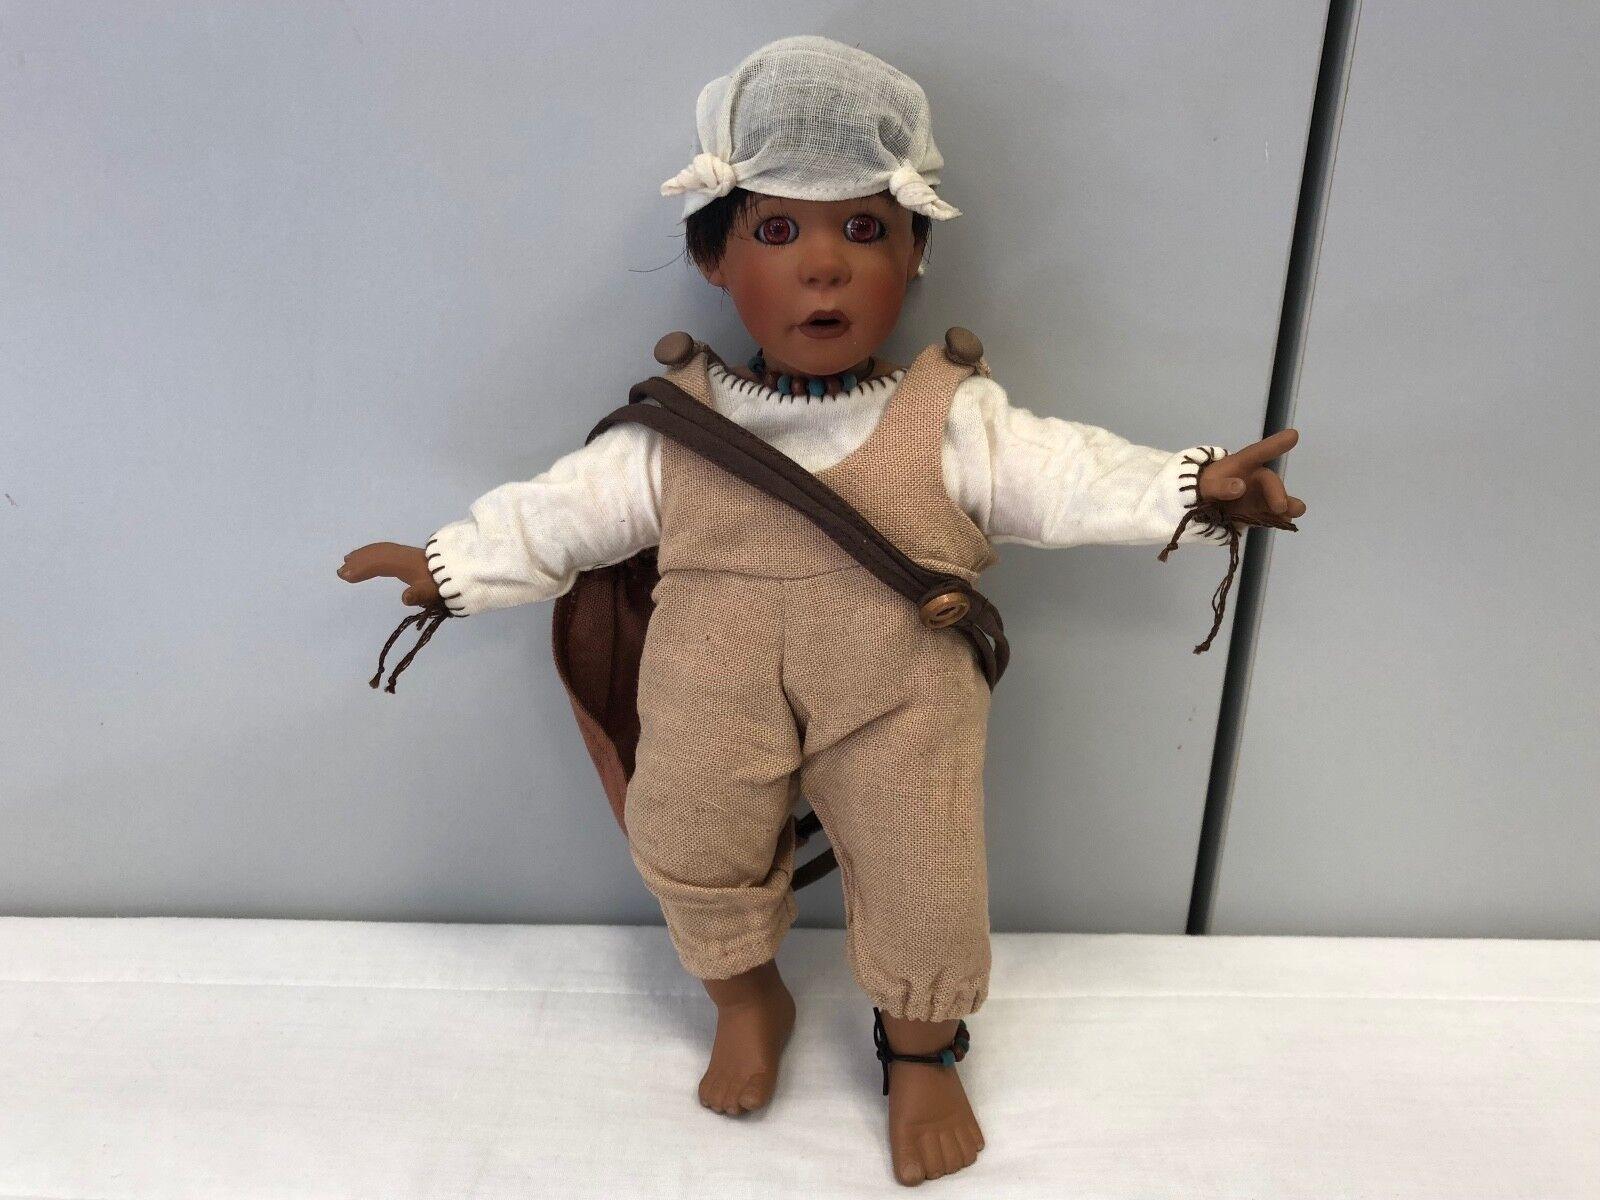 Künstlerpuppe Porzellan Puppe 26 cm. Top Zustand